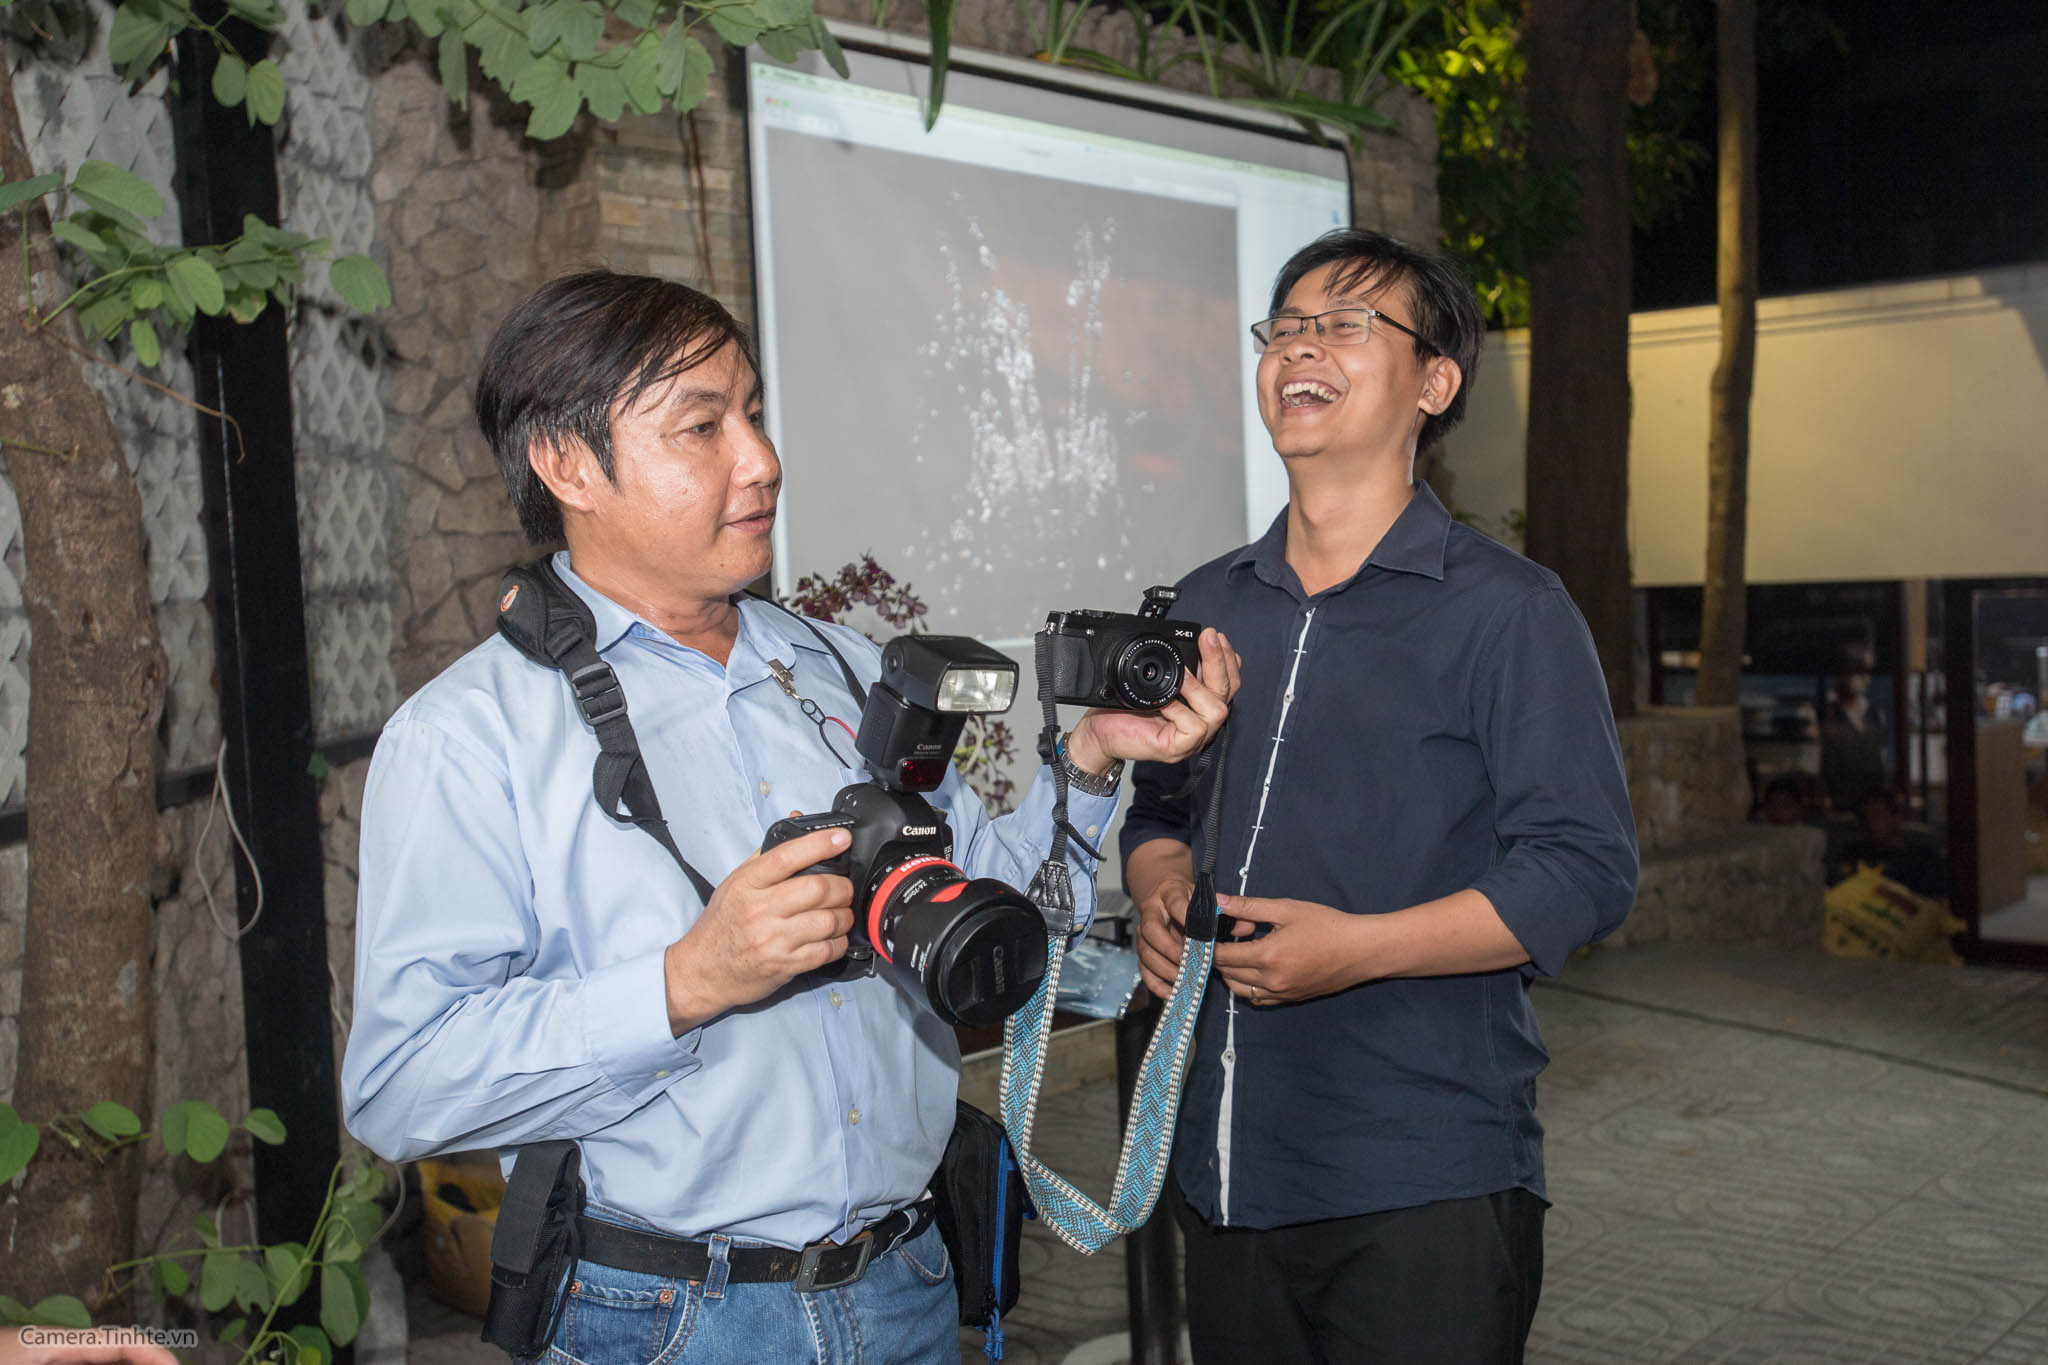 NACB 3 - Flash 2 - Camera.tinhte.vn-17.jpg